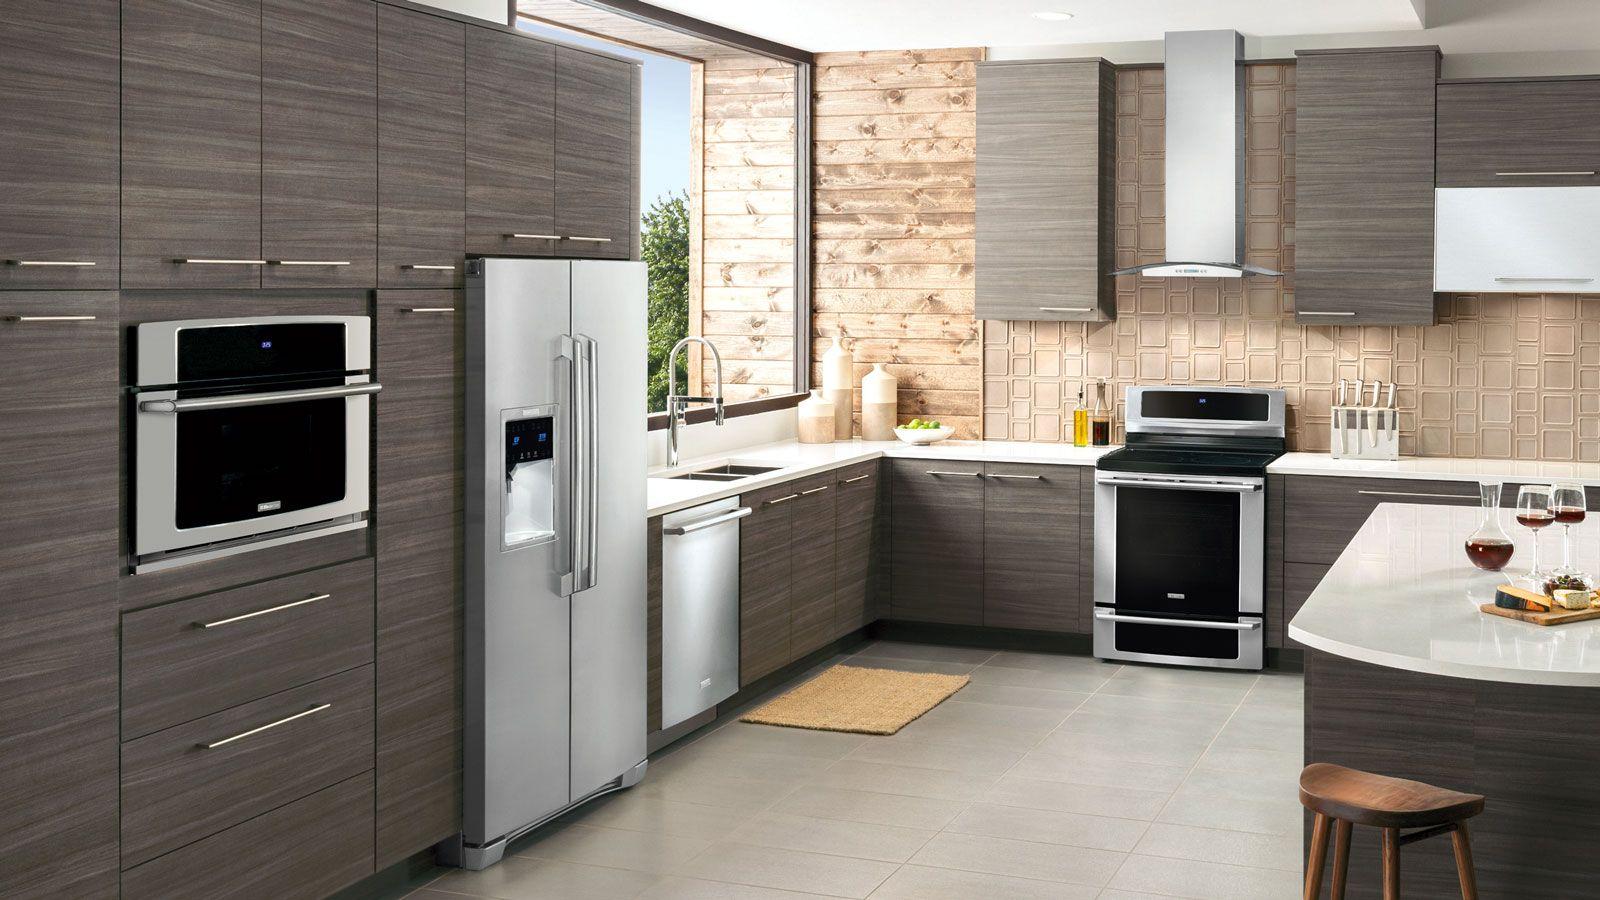 Pin By Paige Lutter On Remodel Electrolux Kitchen Modern Kitchen Kitchen